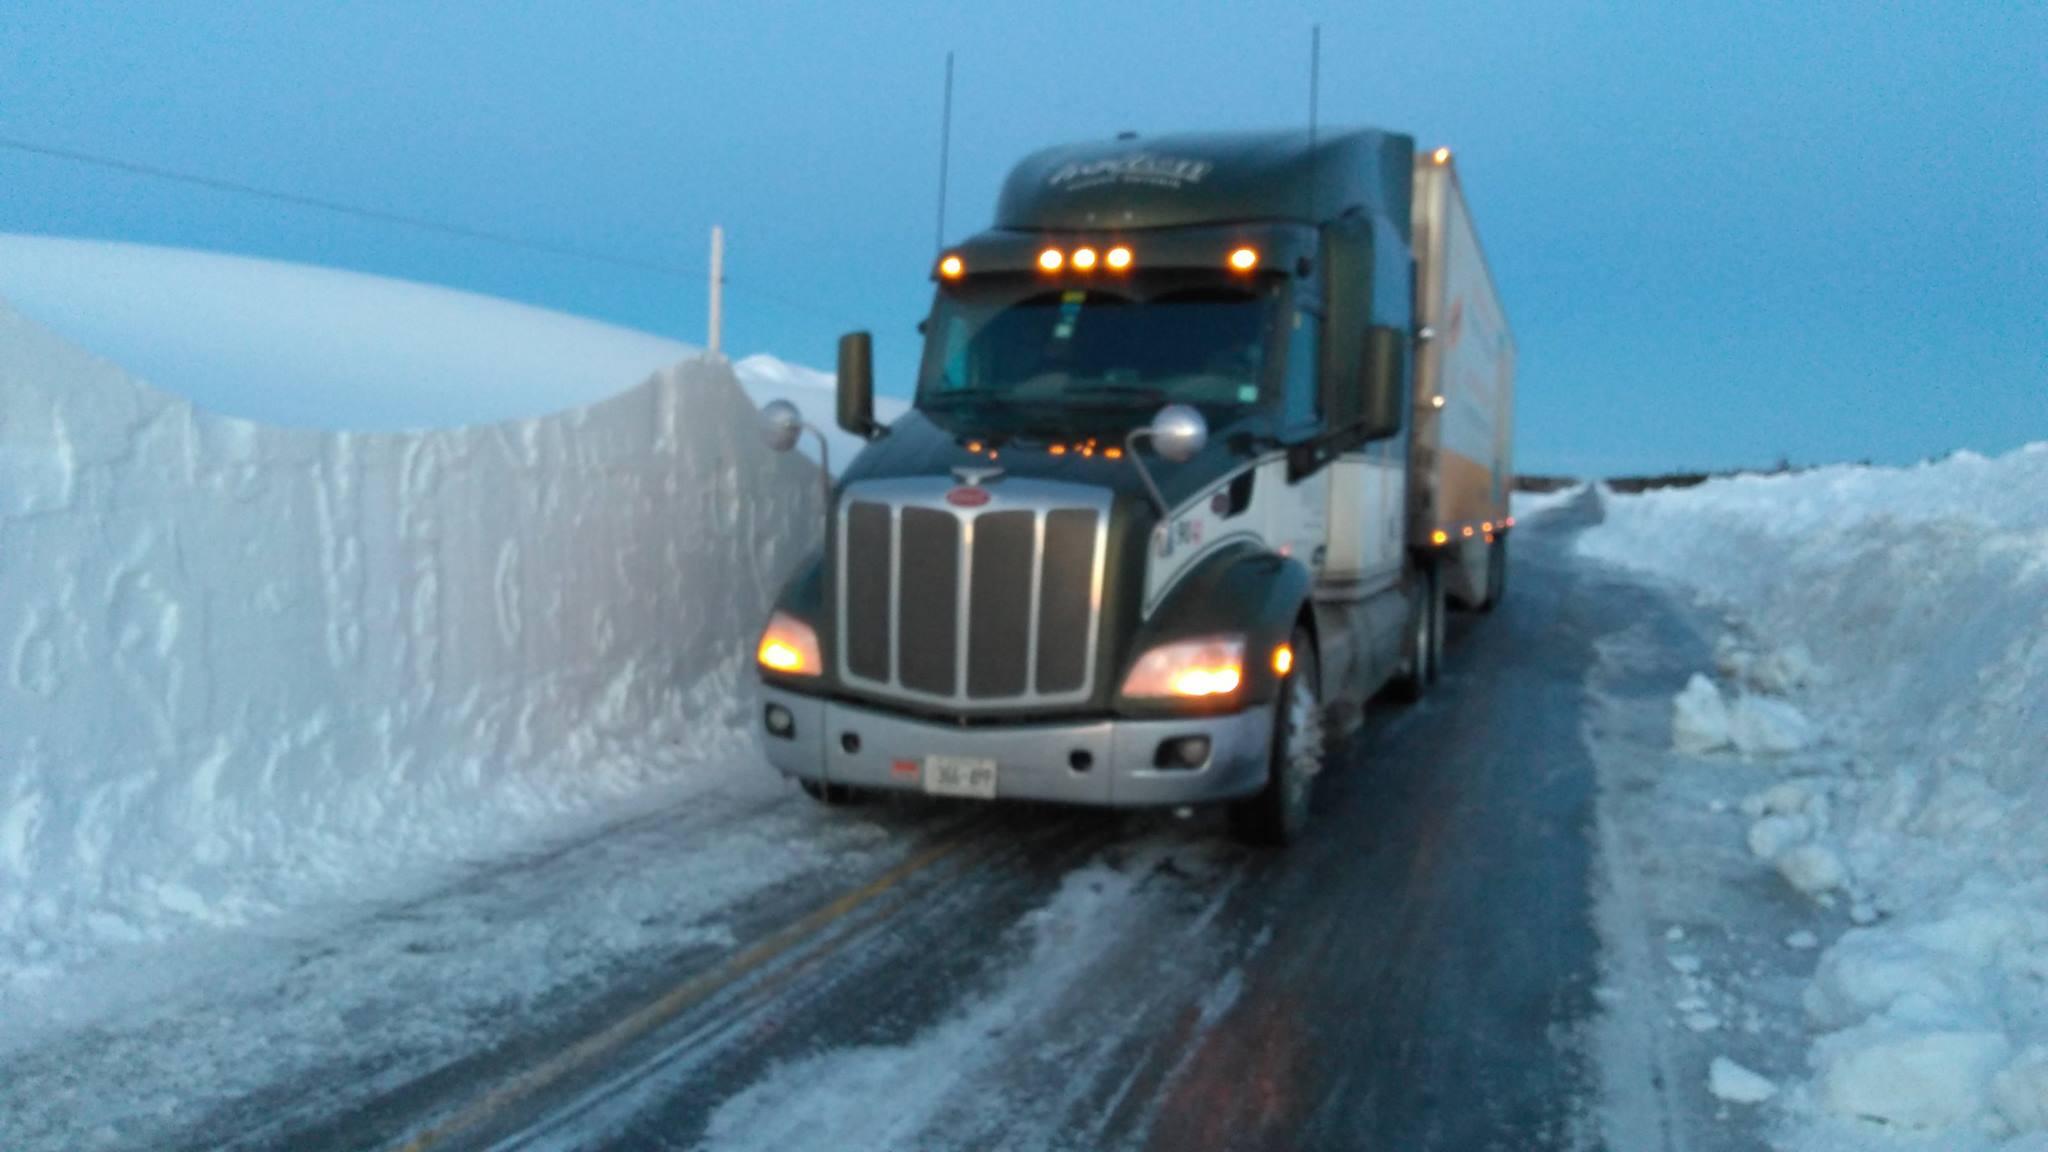 I-think-we-have-enough-snow-Newfoundland--8-4-2019--5